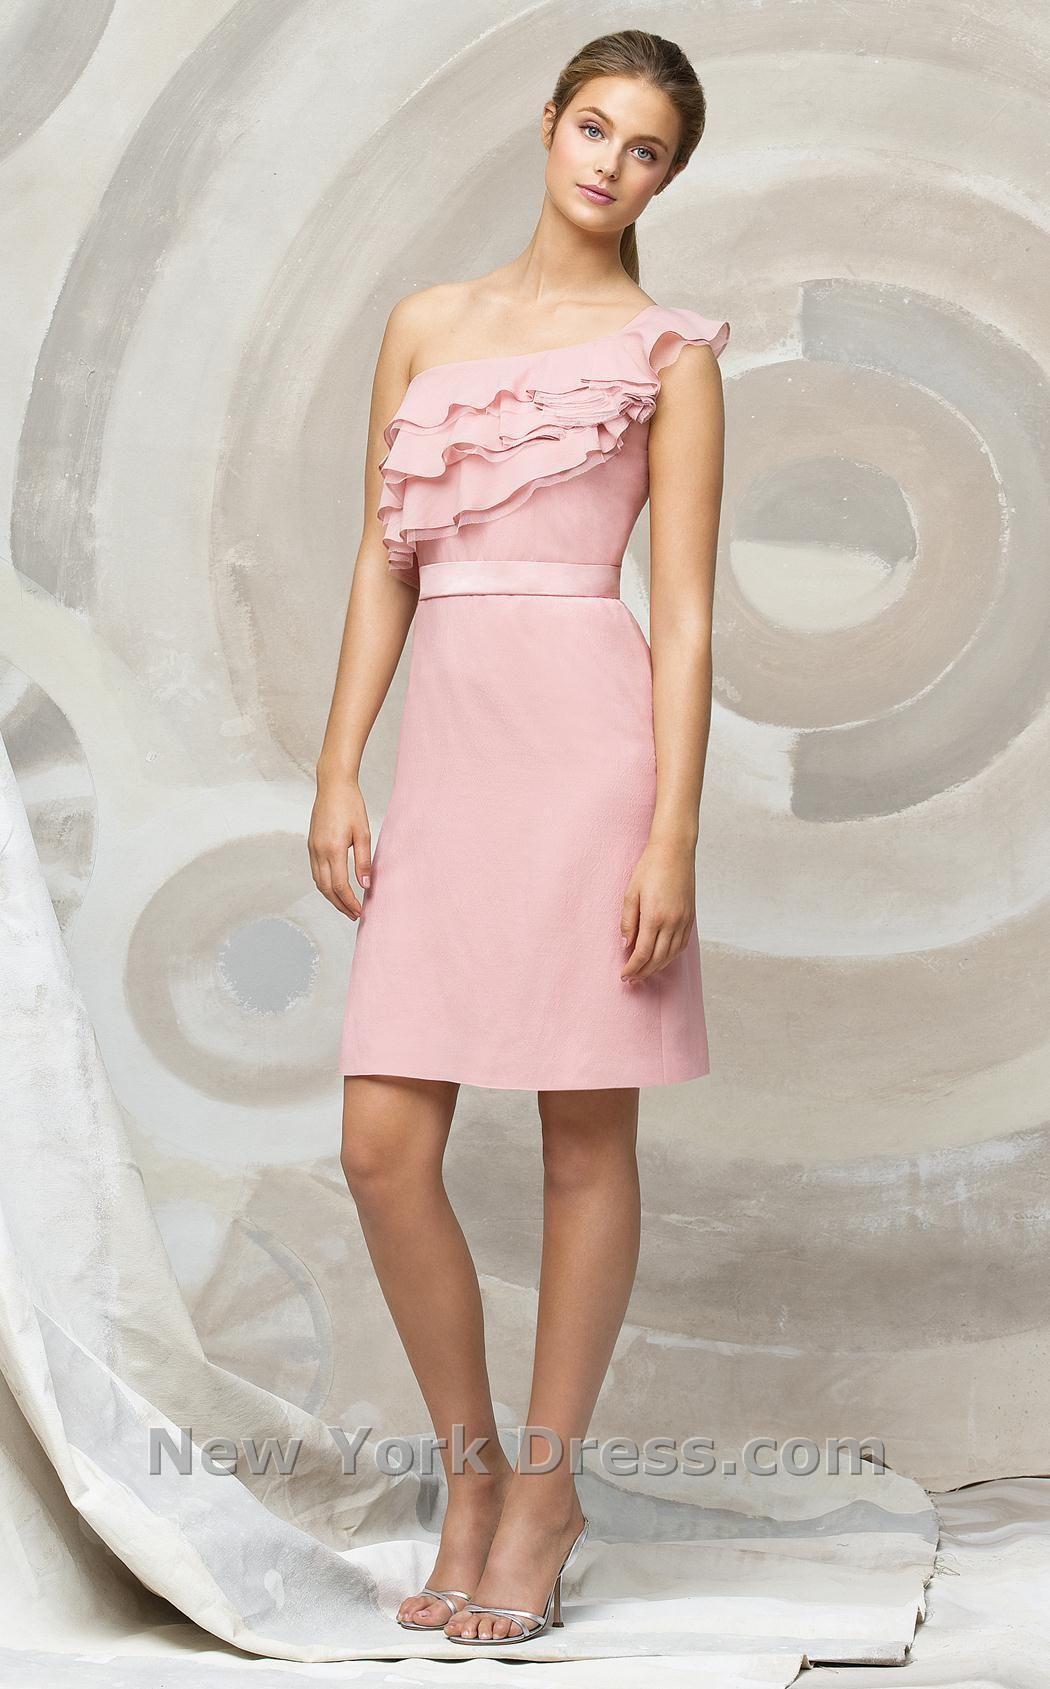 En rosa.   Styles / Fashion / Moda   Pinterest   Rosas